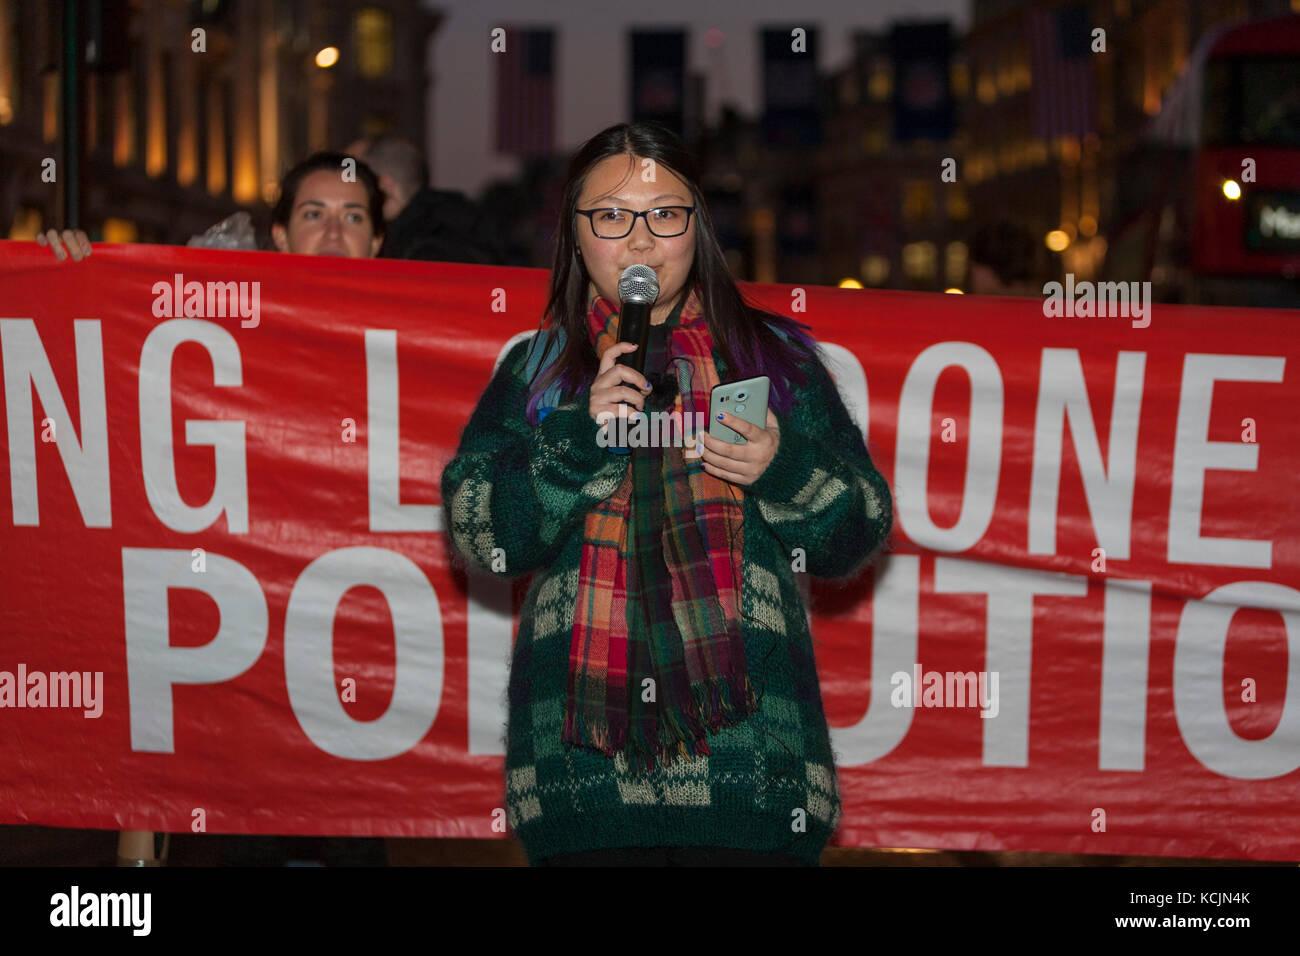 London, UK. 5th Oct, 2017. Stop Killing Londoners Protest: Oxford Circus, London UK. 5th October, 2017. Stop Killing - Stock Image